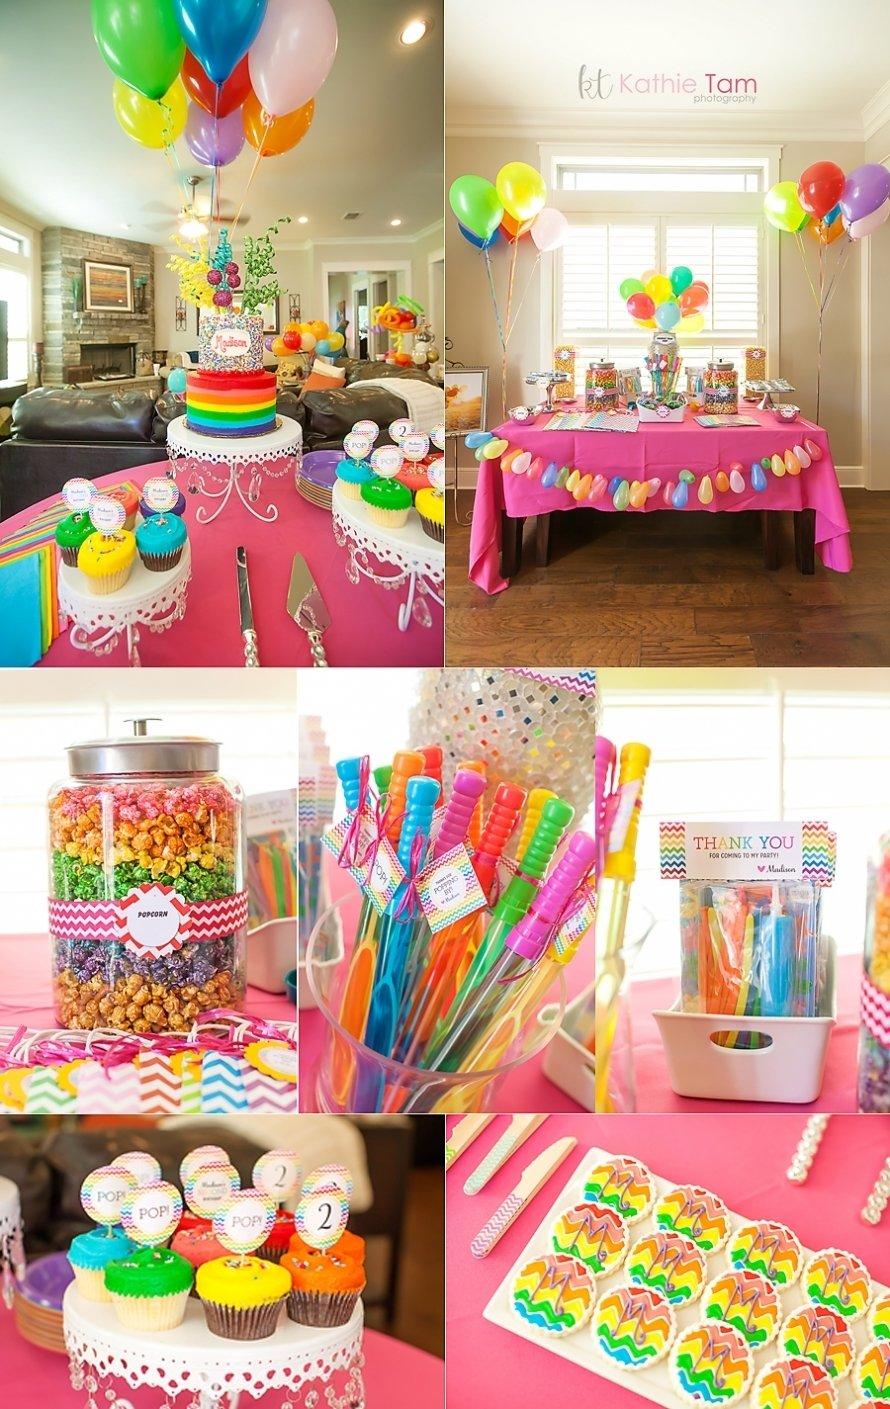 10 Stylish Birthday Party Ideas San Antonio birthday party ideas birthday party ideas san antonio 2020